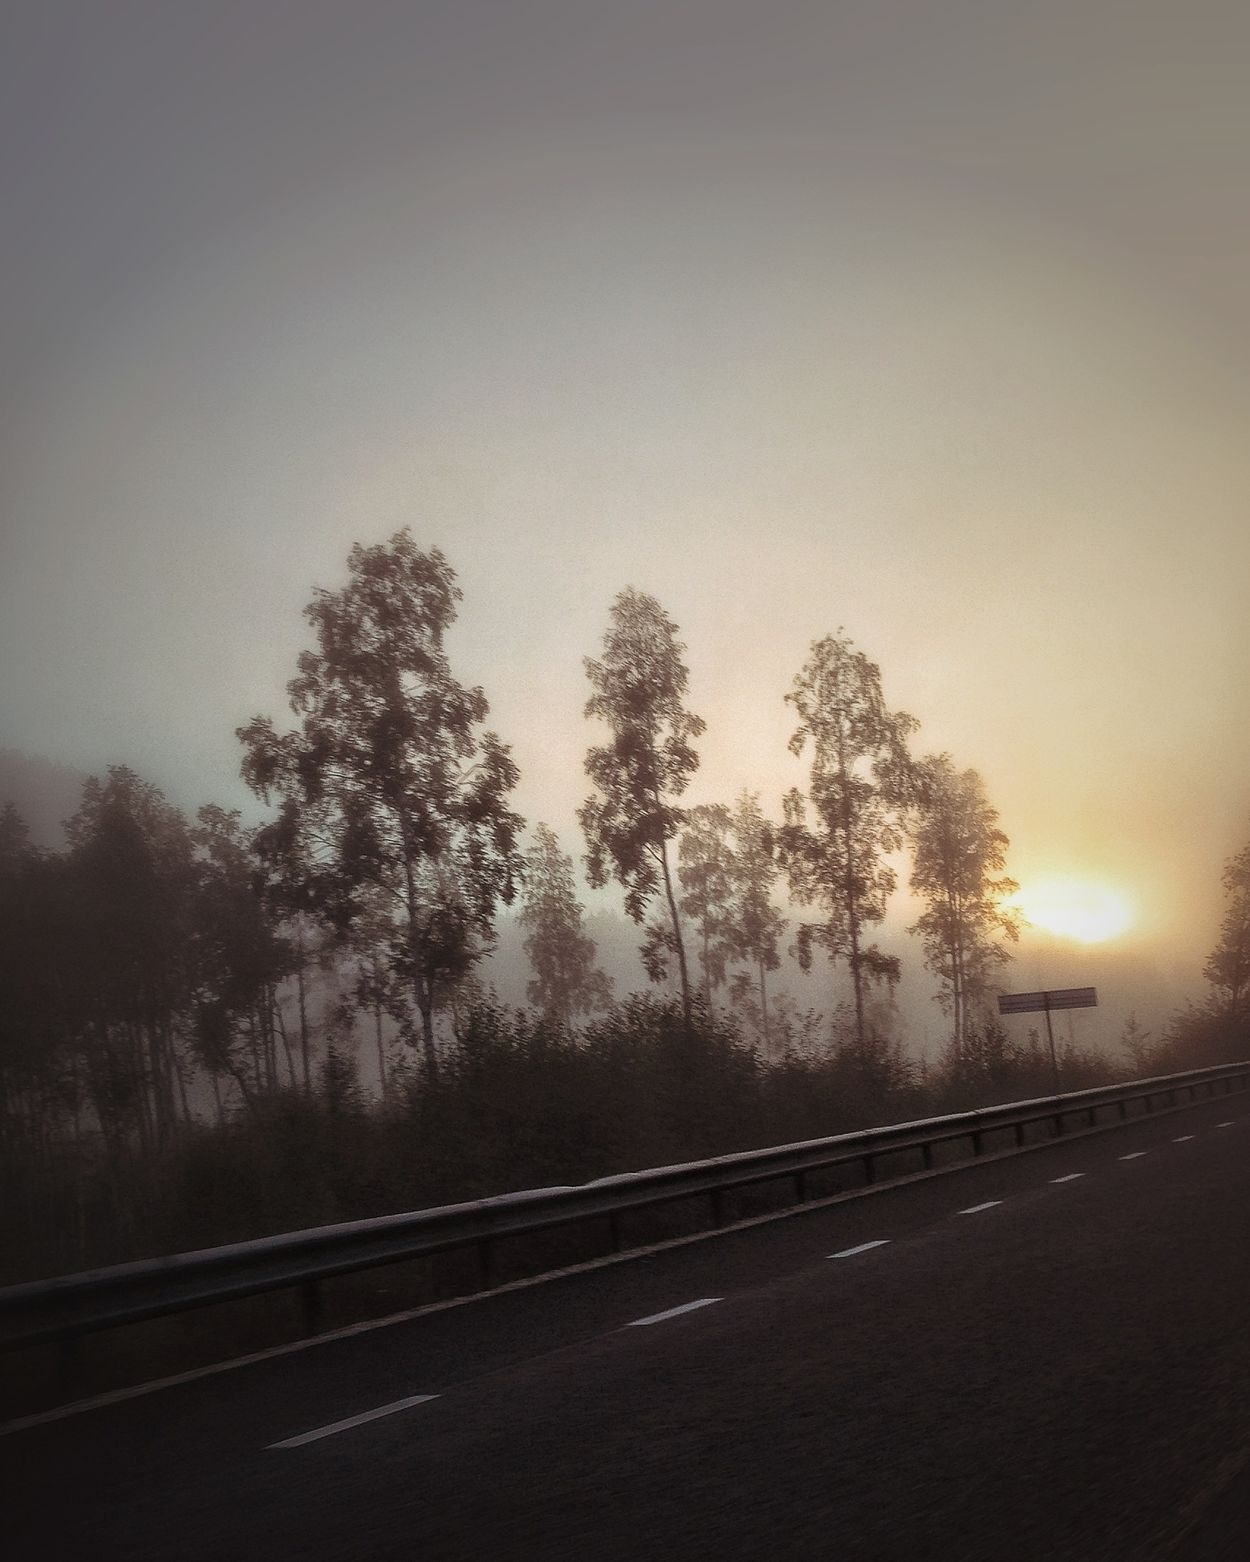 On The Road ! EyeEm Best Shots - Trees EyeEm Nature Lover